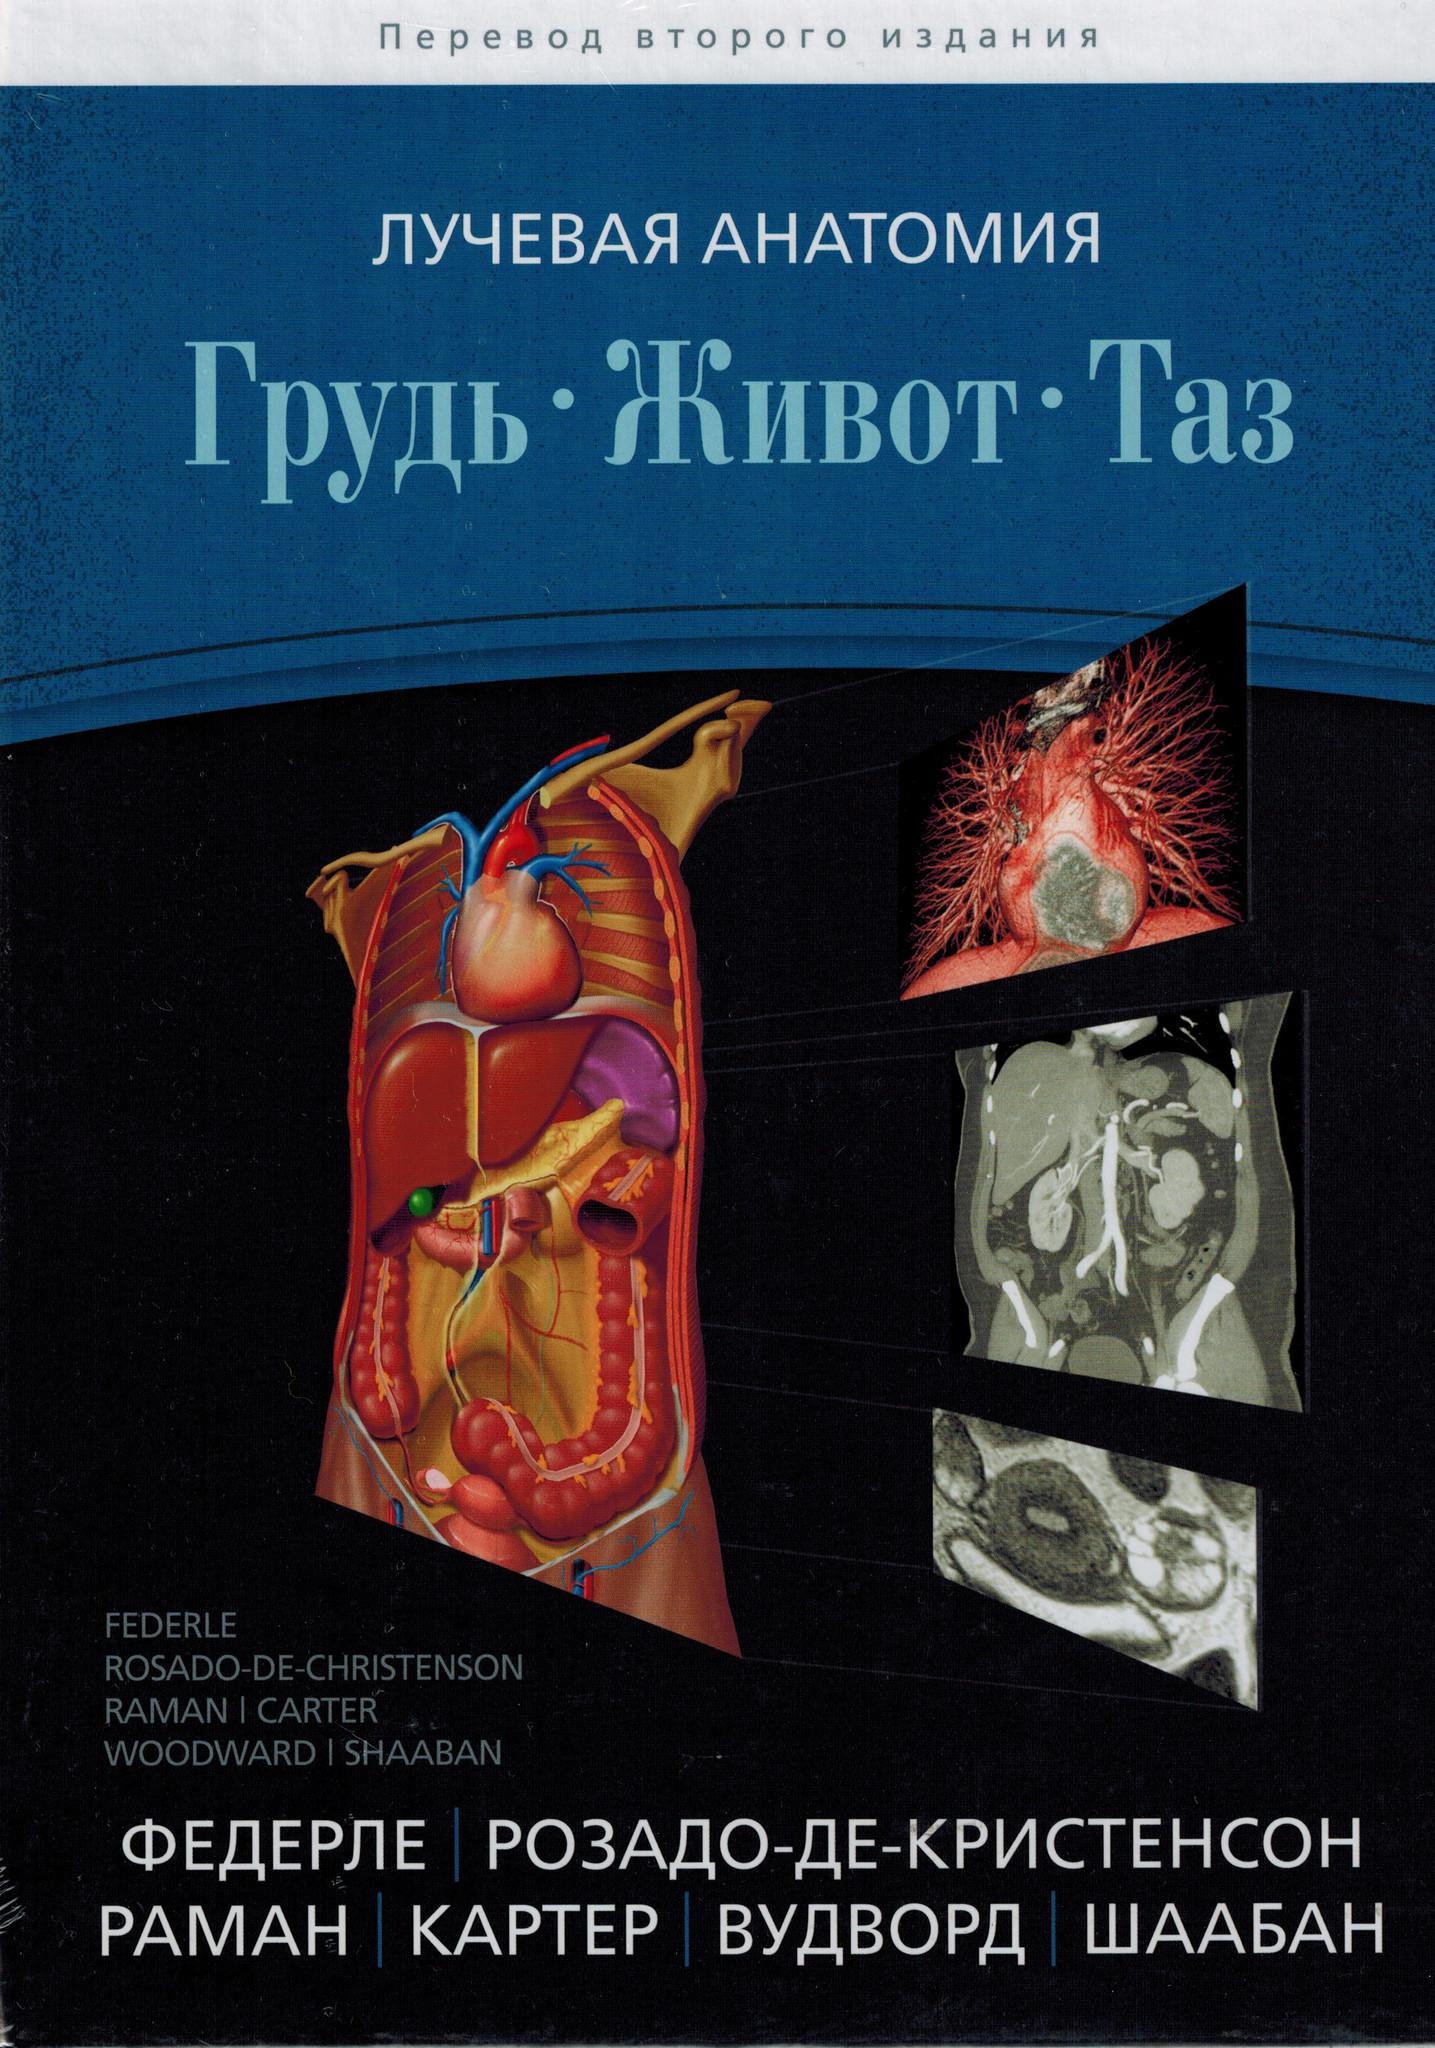 Каталог Лучевая анатомия. Грудь, живот, таз gt.jpg